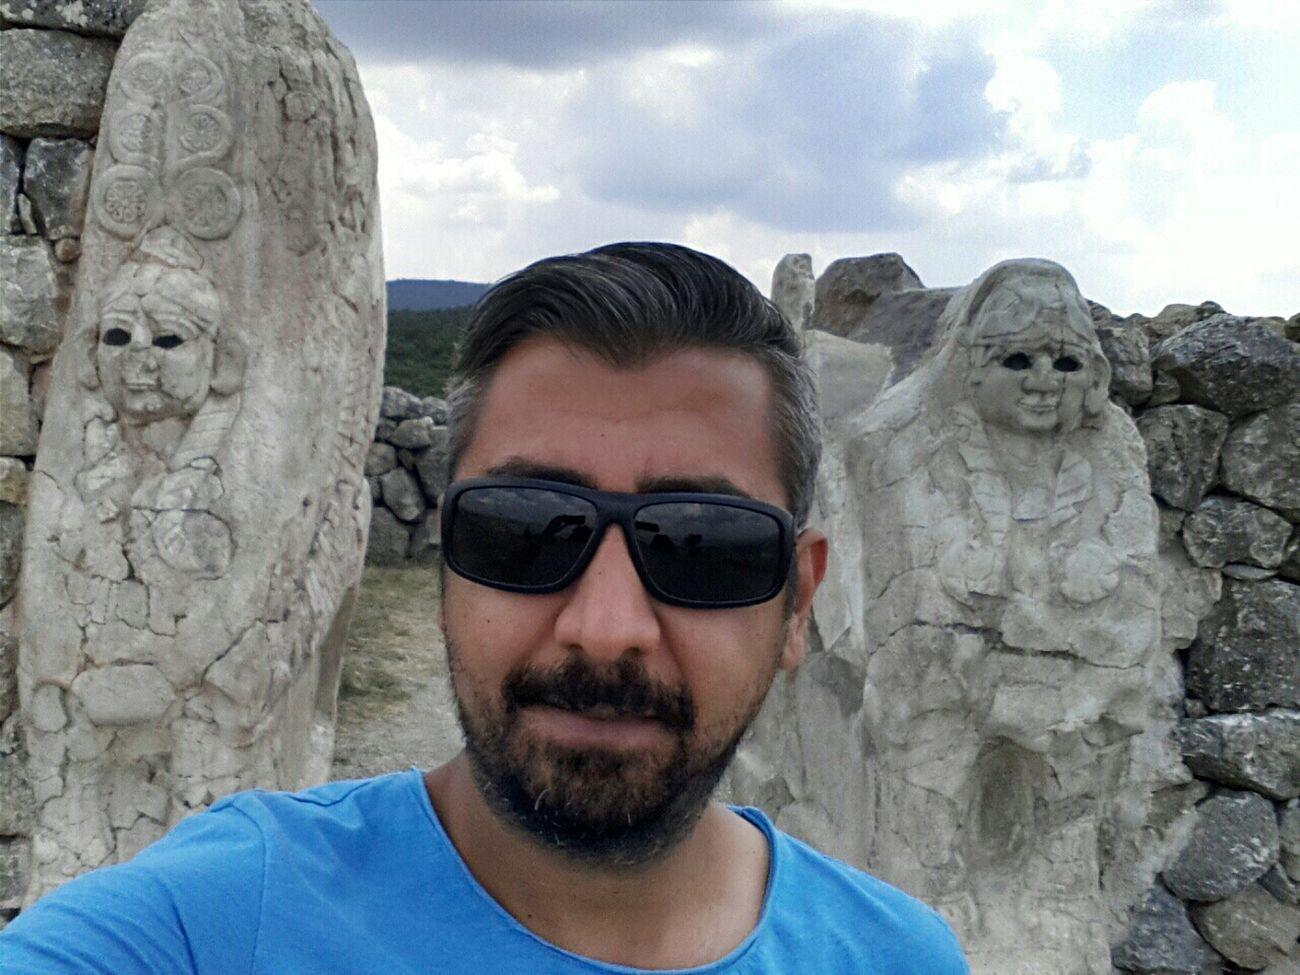 Çorum, Hitit medeniyeti Hattuşa kenti Hititte Hattusas Çorum City Traveling Vscocam Historical Building Turkey Hi! ThatsMe Vacation Time